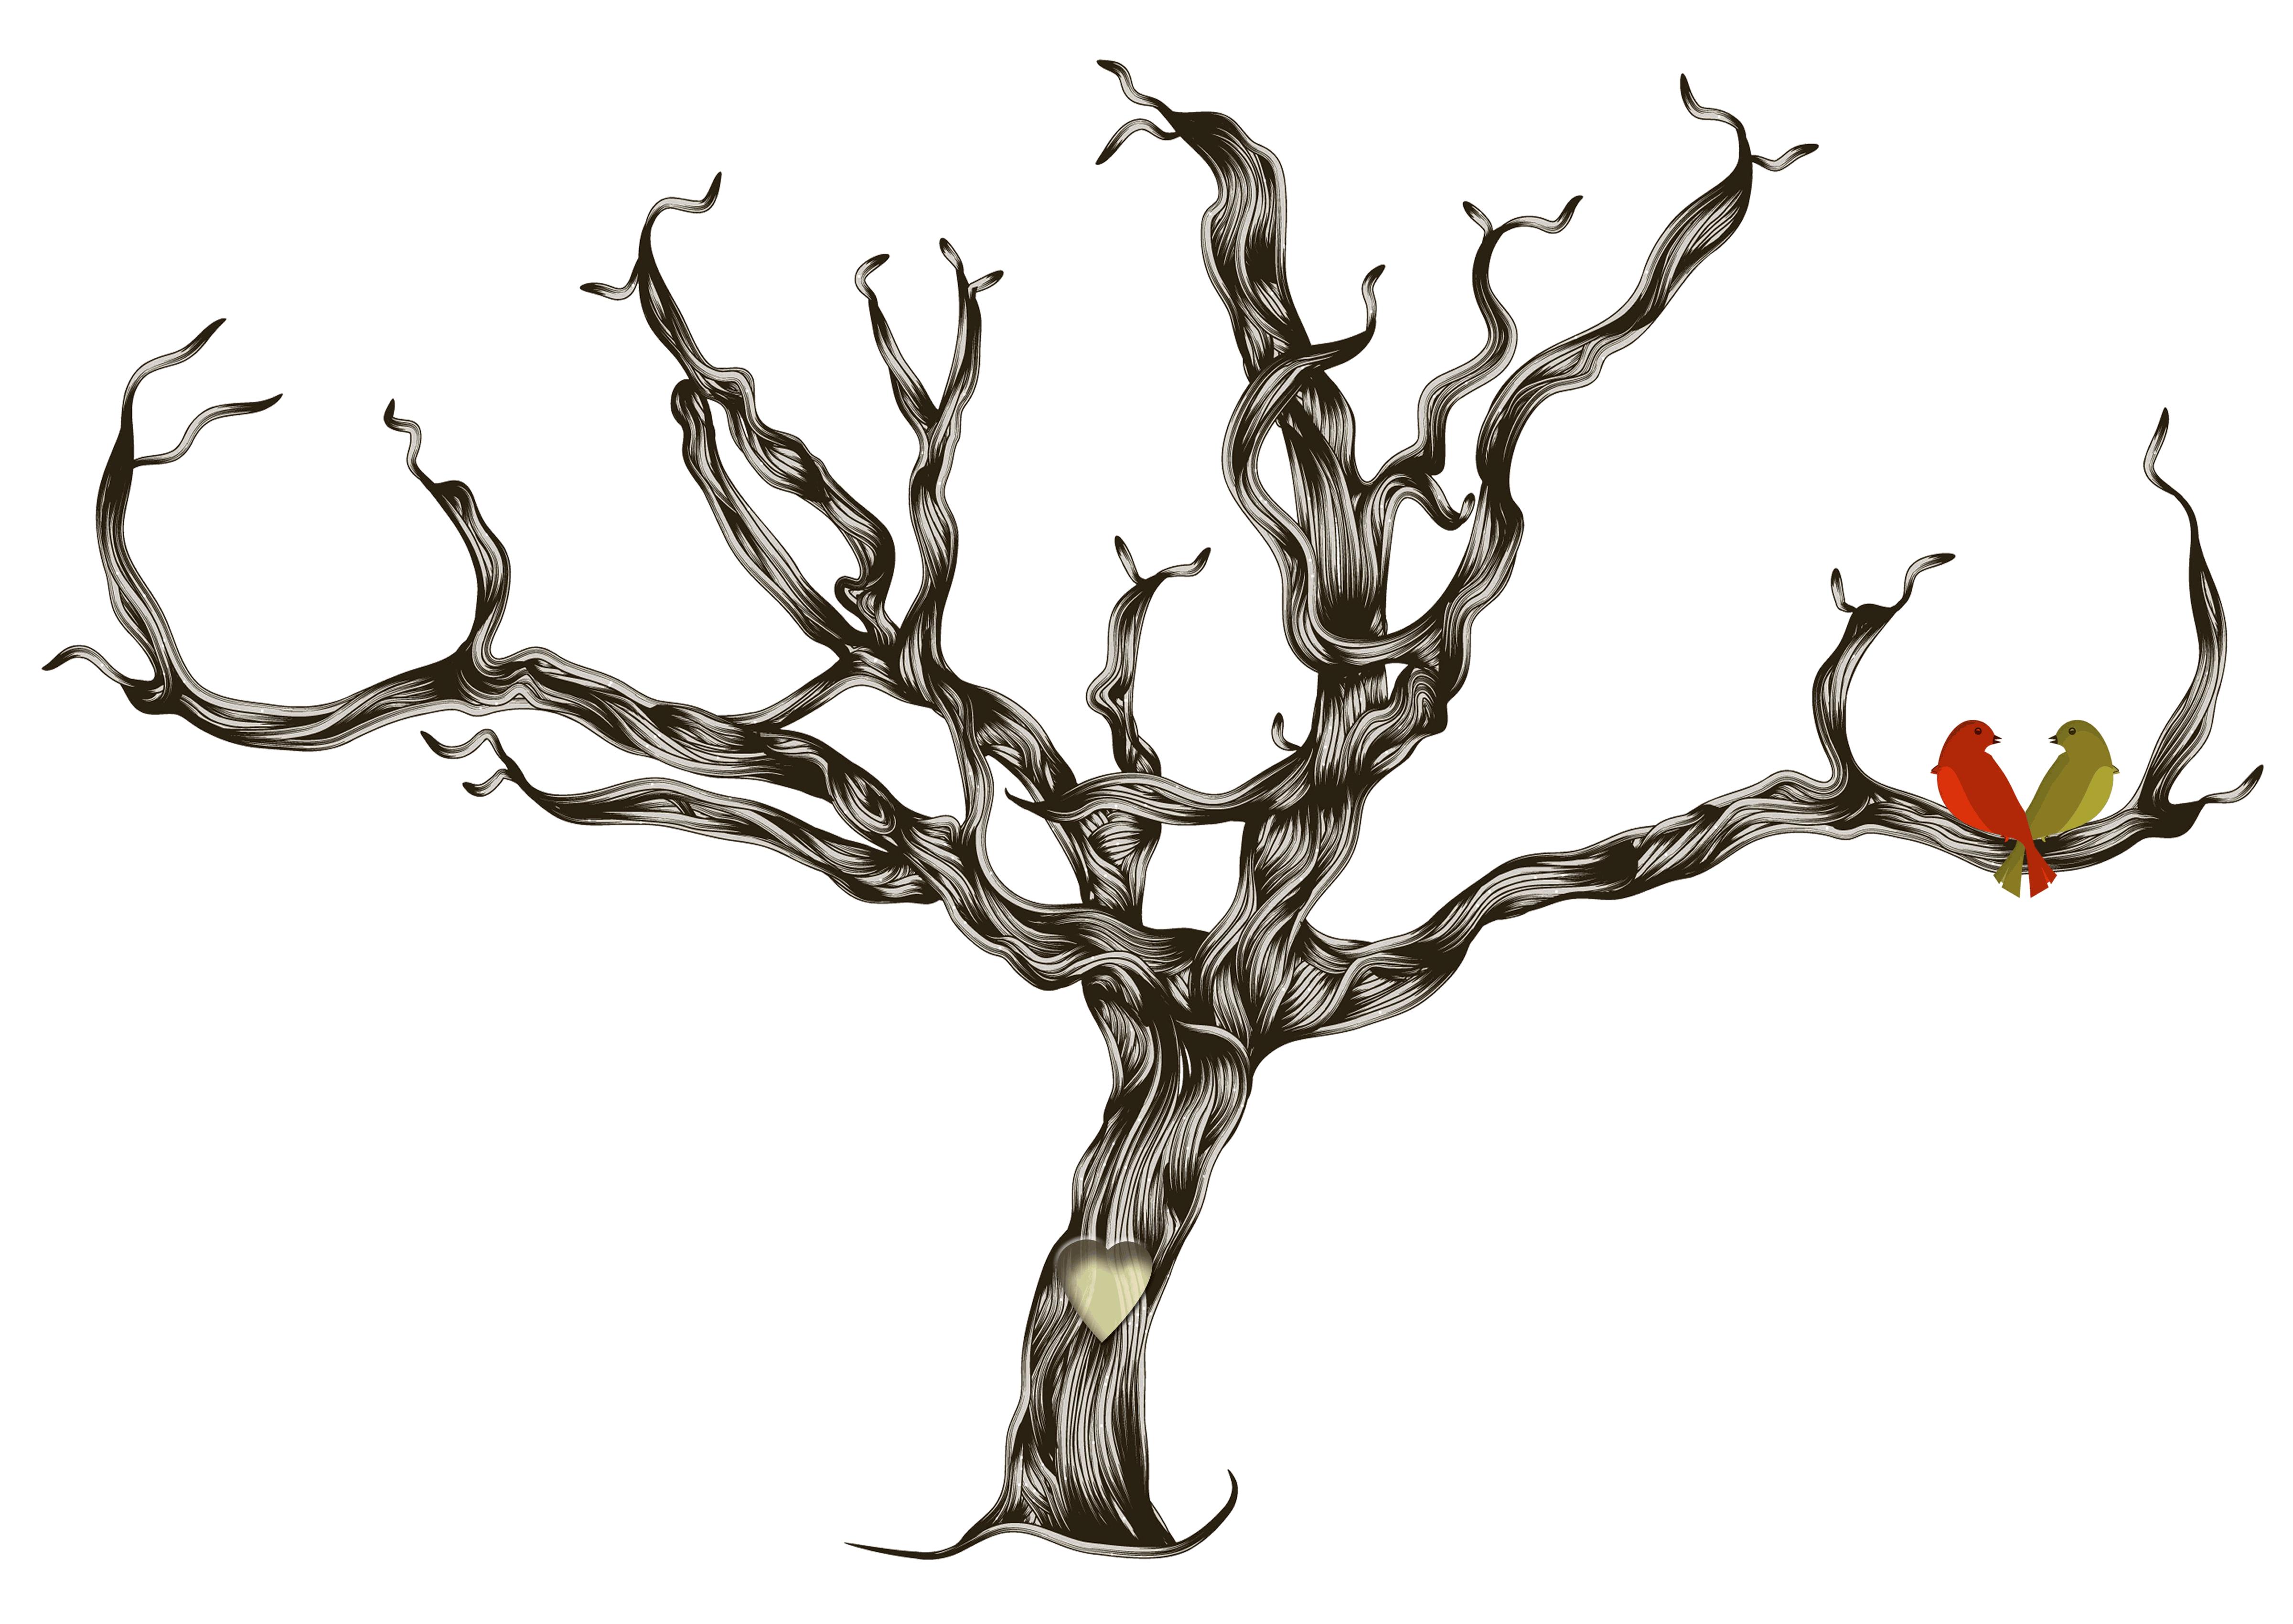 Дерево пожеланий своими руками шаблон скачать